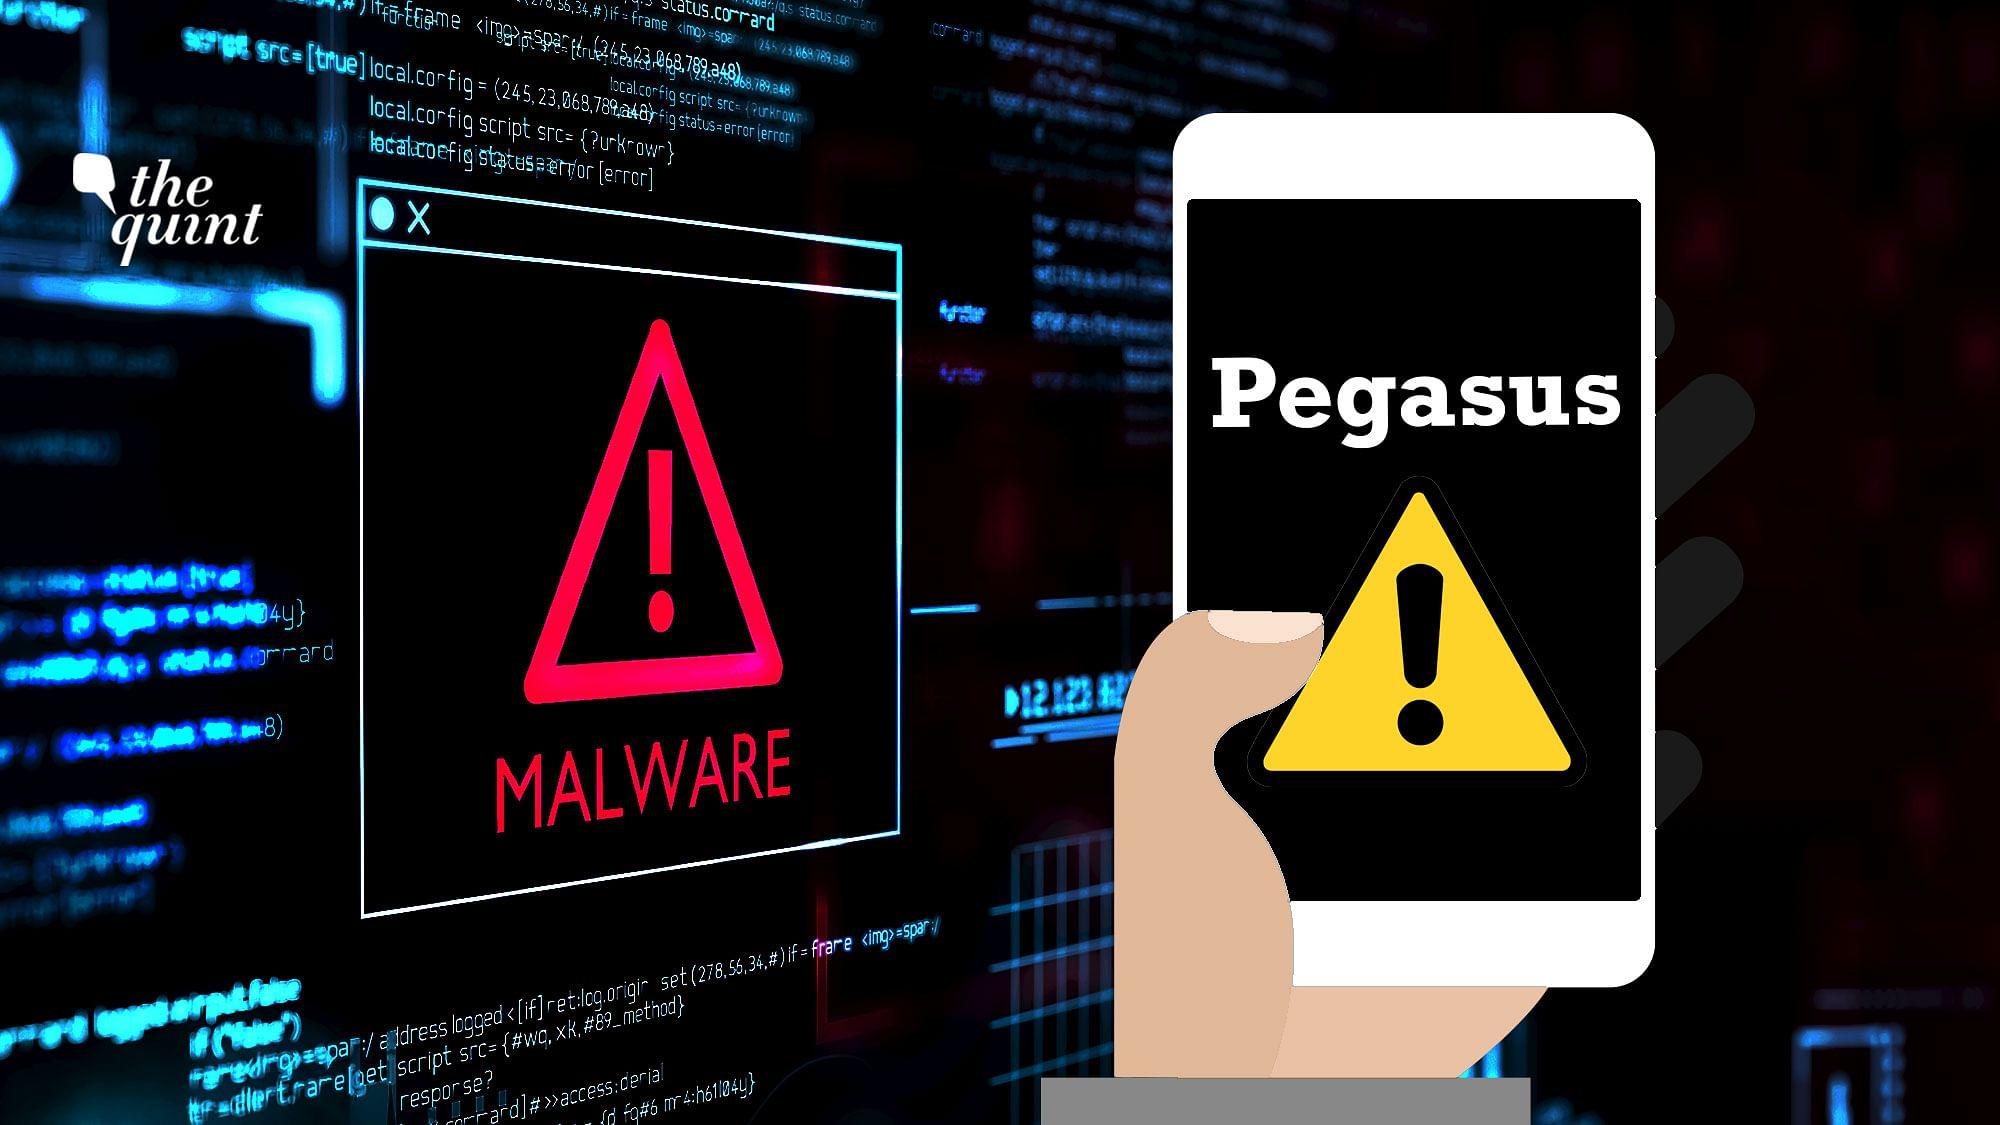 Pegasus spyware, Monsoon session